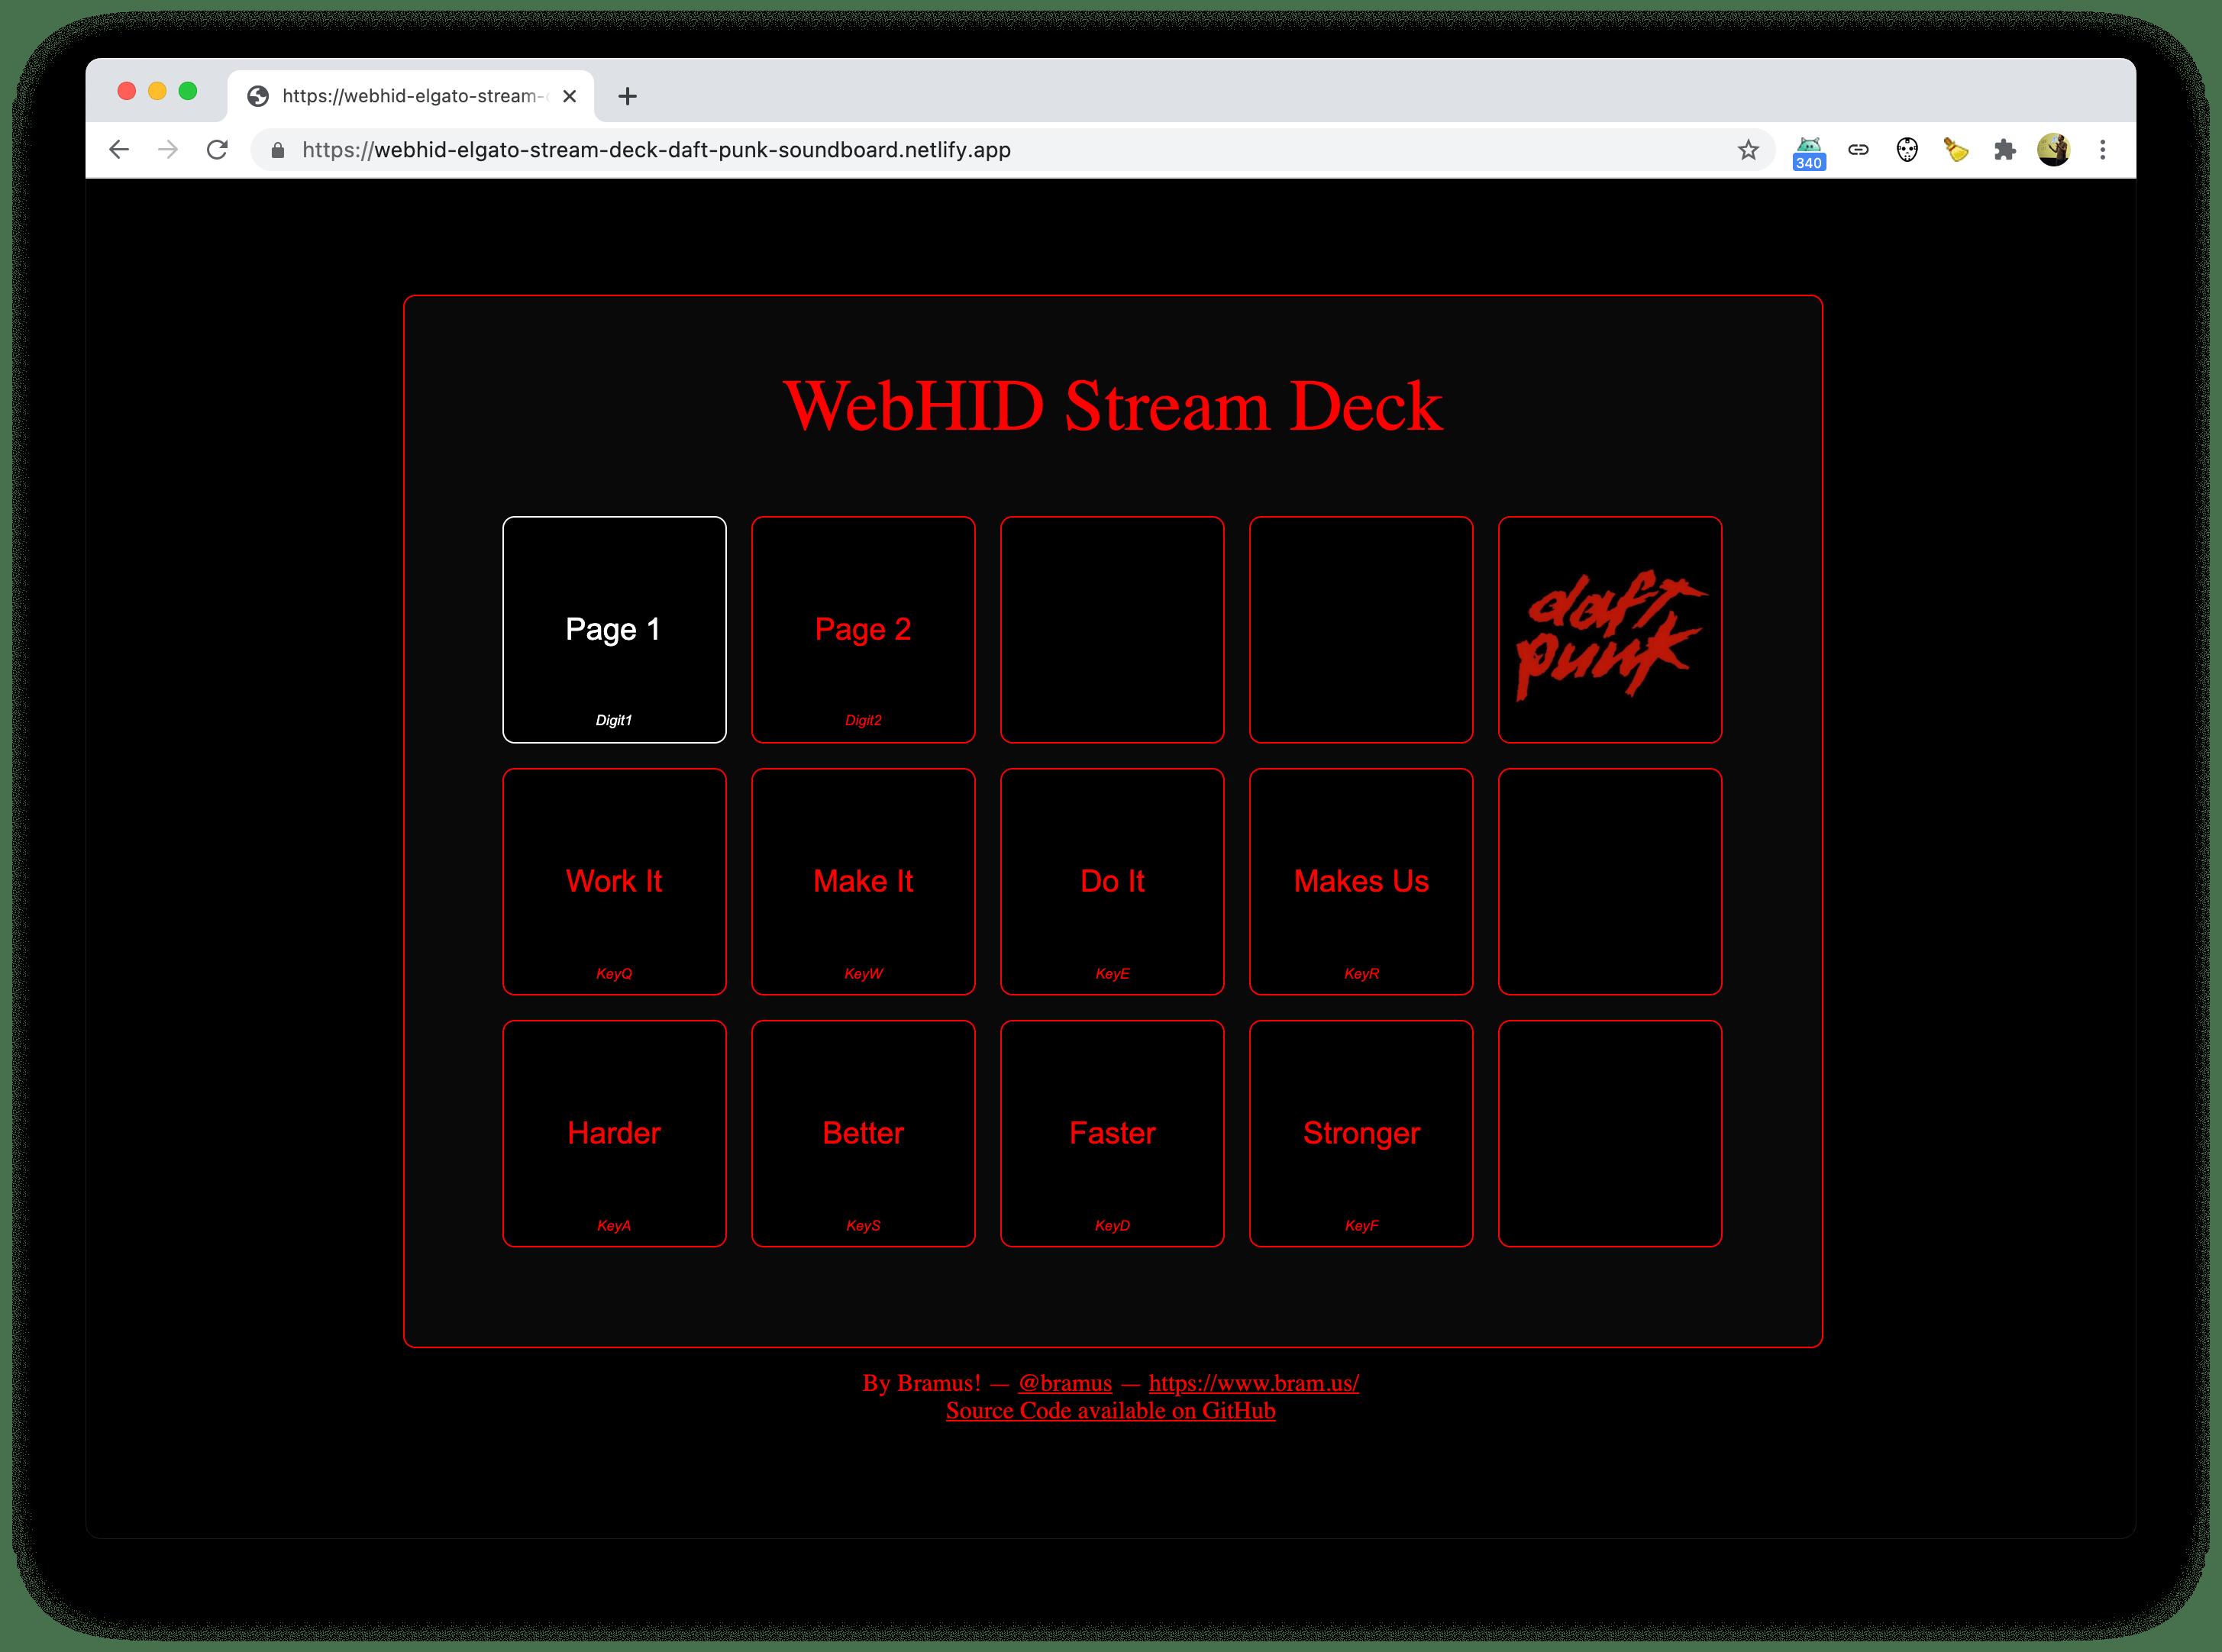 webhid-elgato-stream-deck-daft-punk-soundboard.png